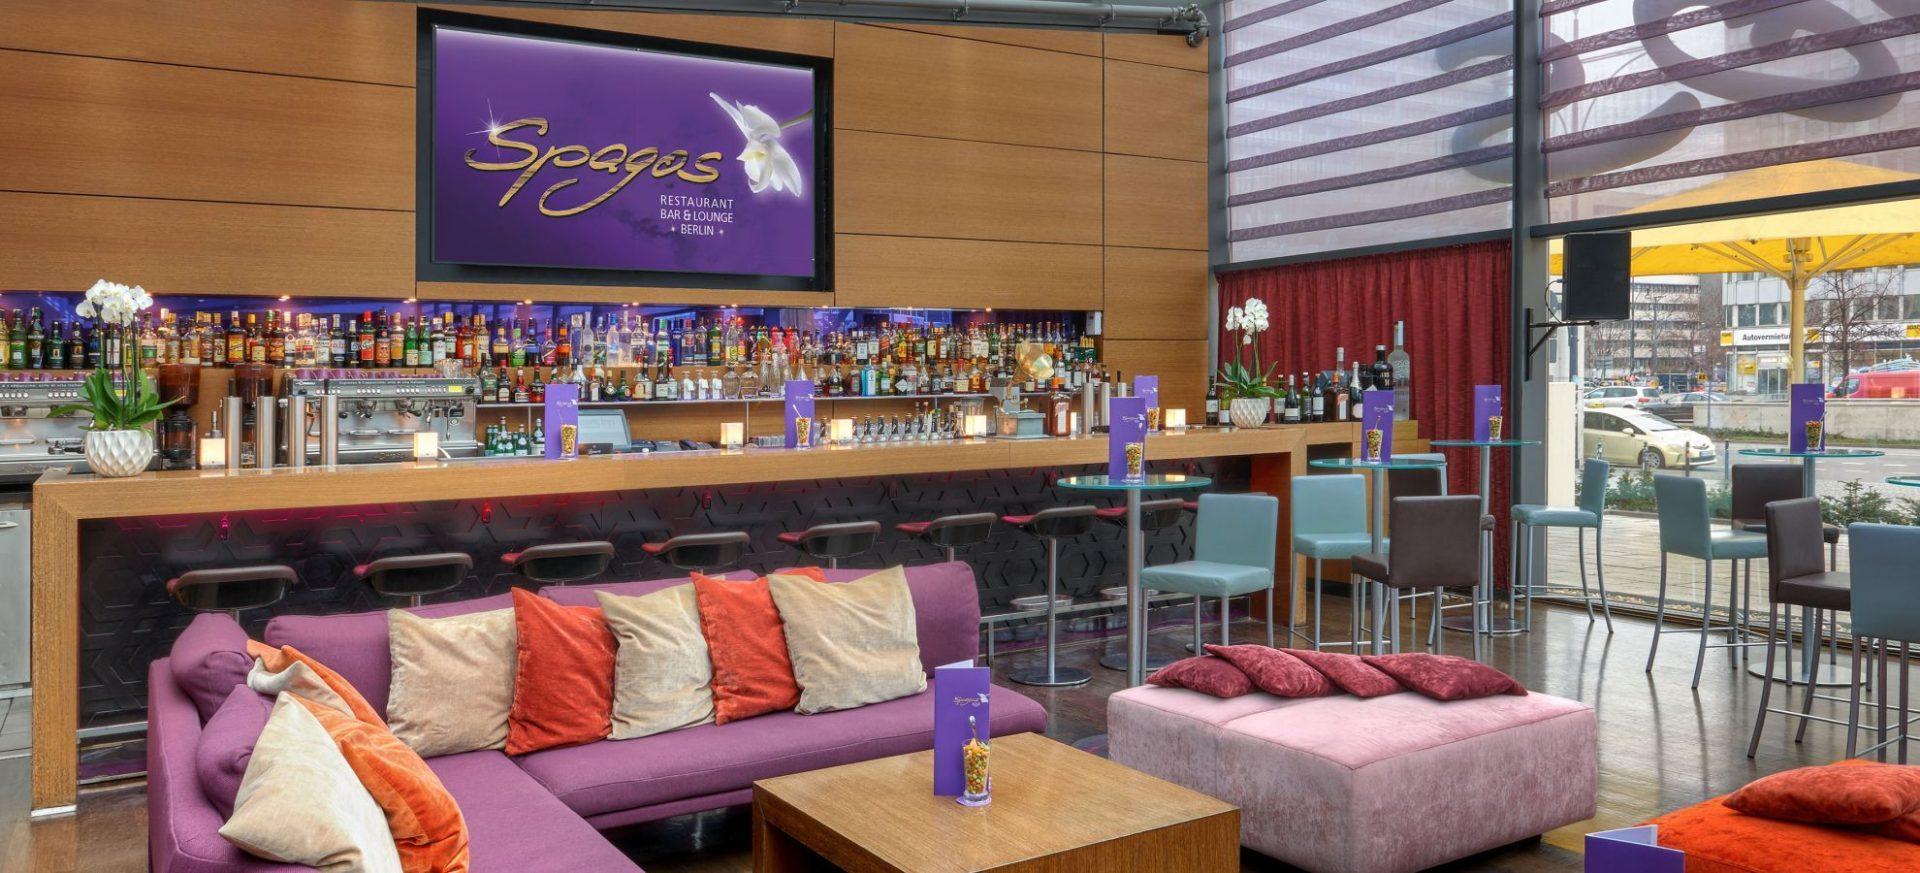 Park-Inn-by-Radisson-Berlin-Alexanderplatz-Spagos-Restaurant-Bar-Lounge